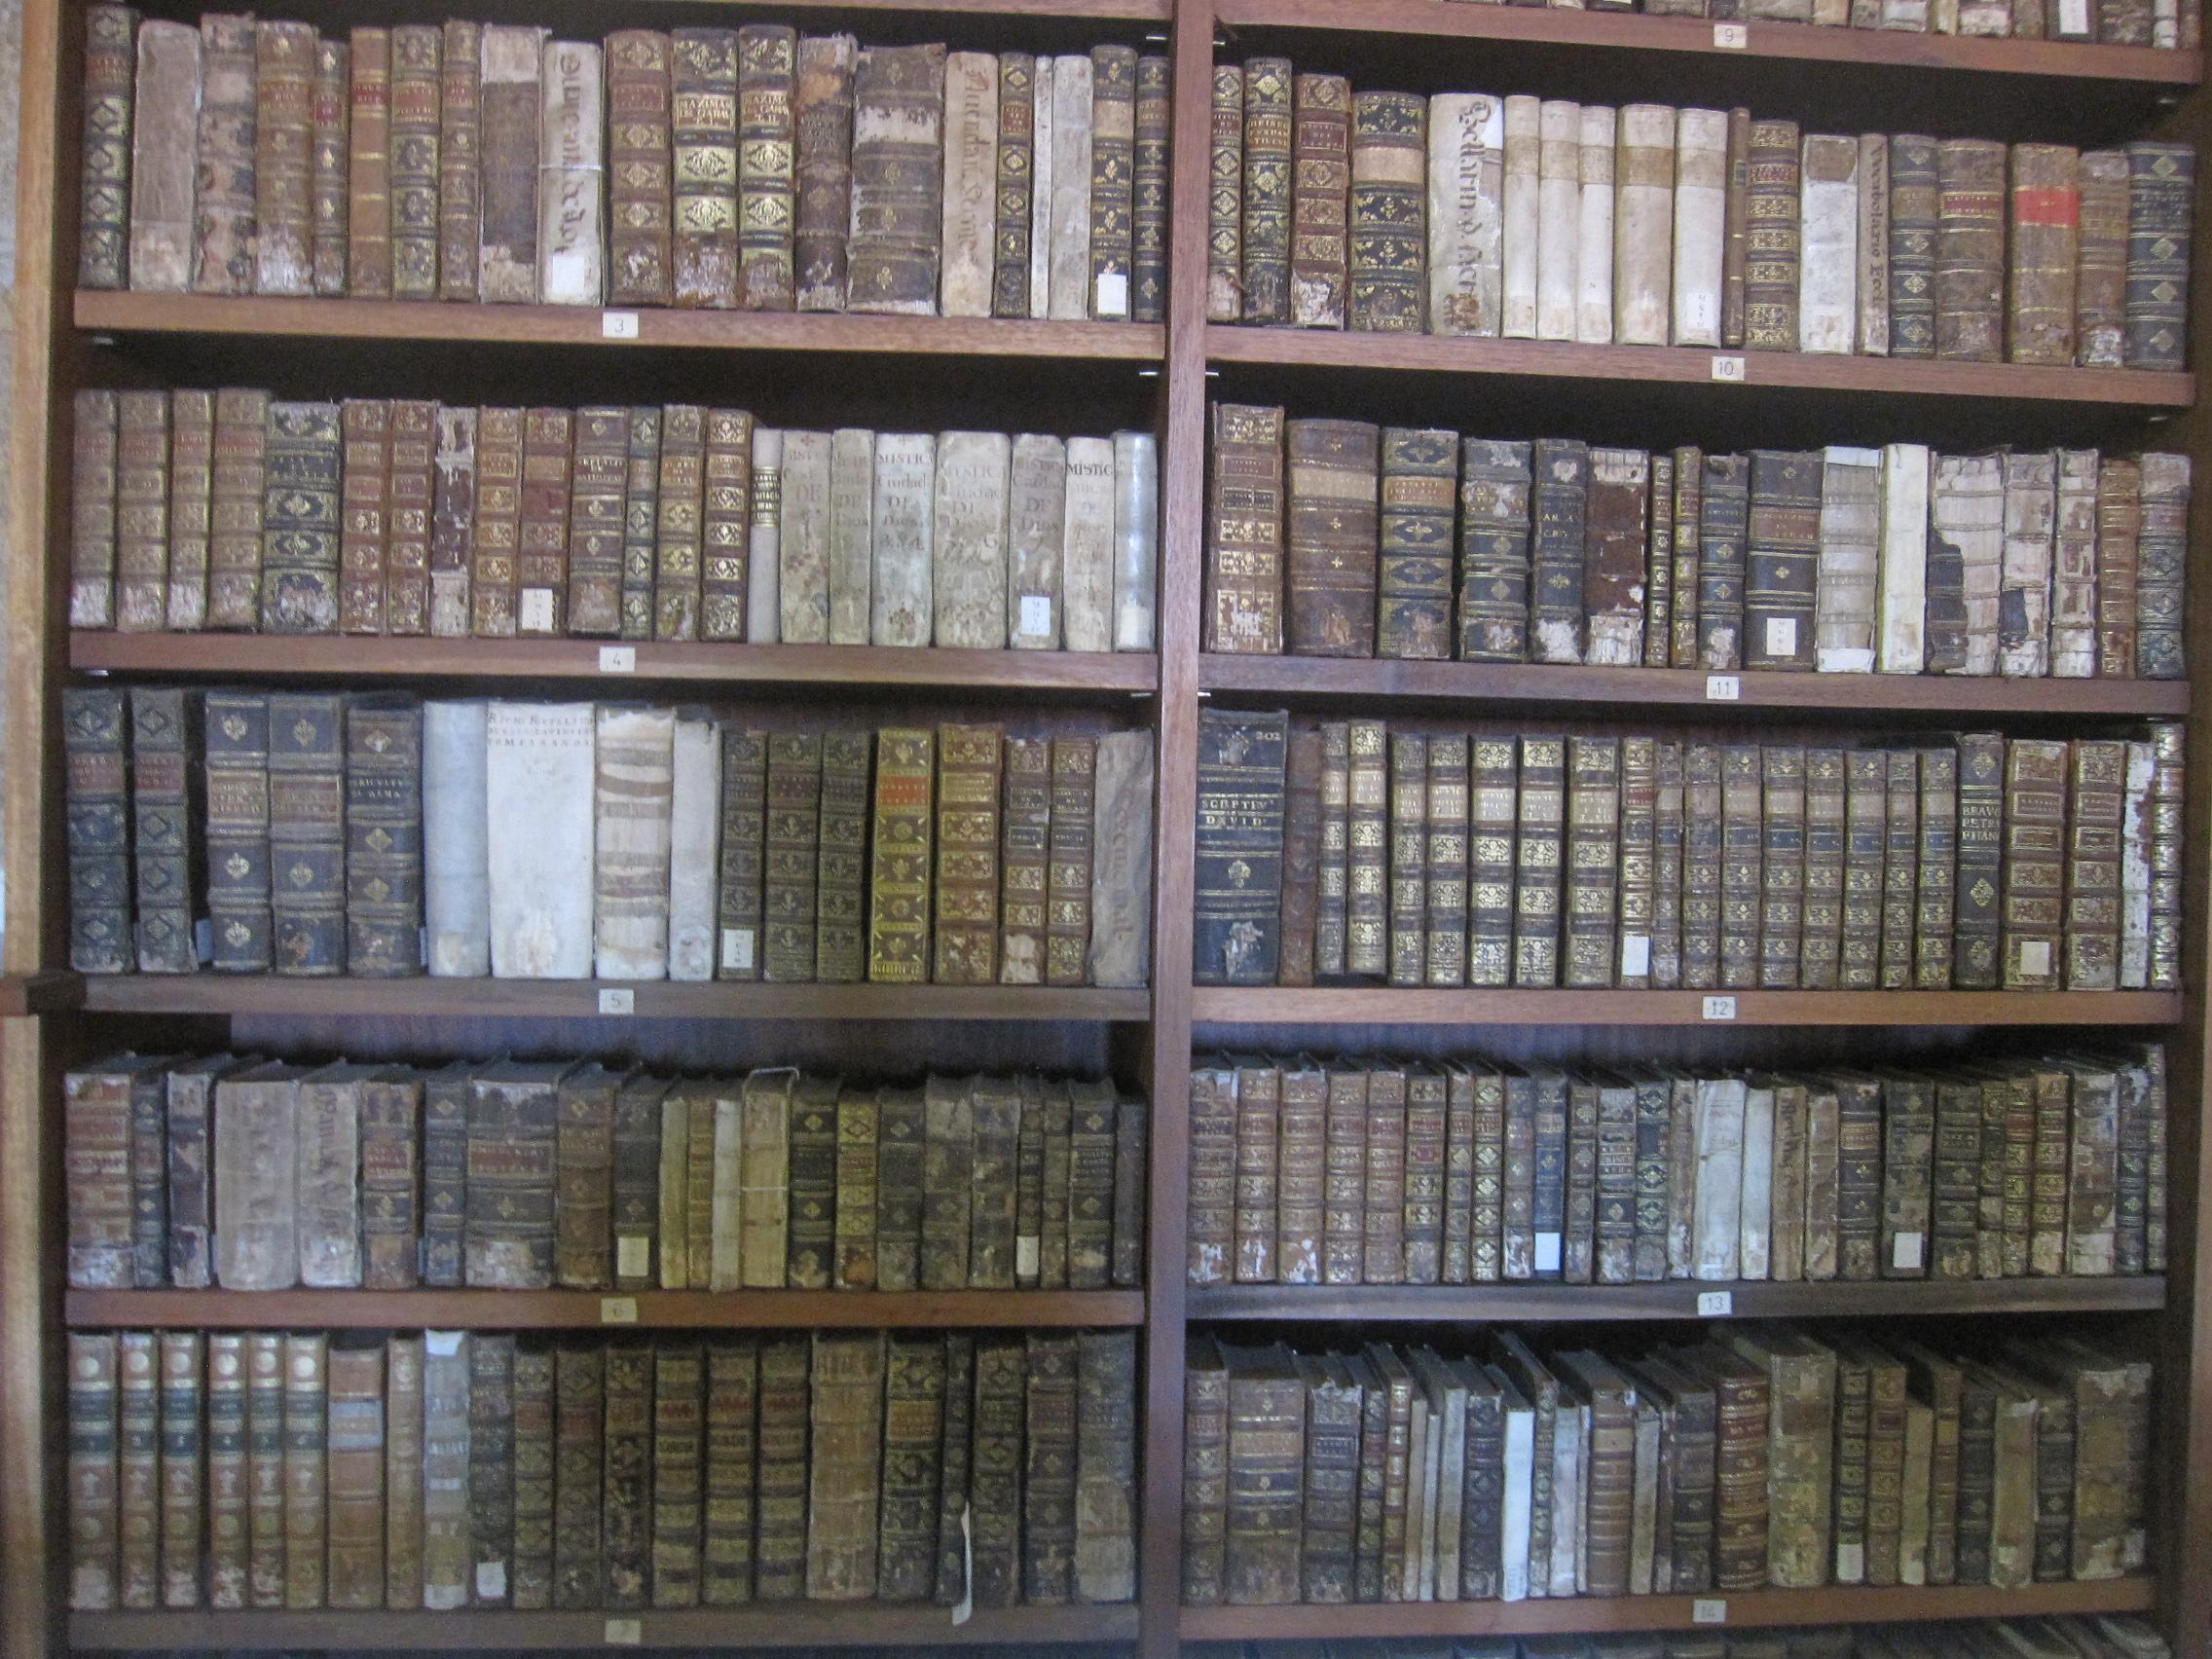 Biblioteca-Joanina-vieux-livres